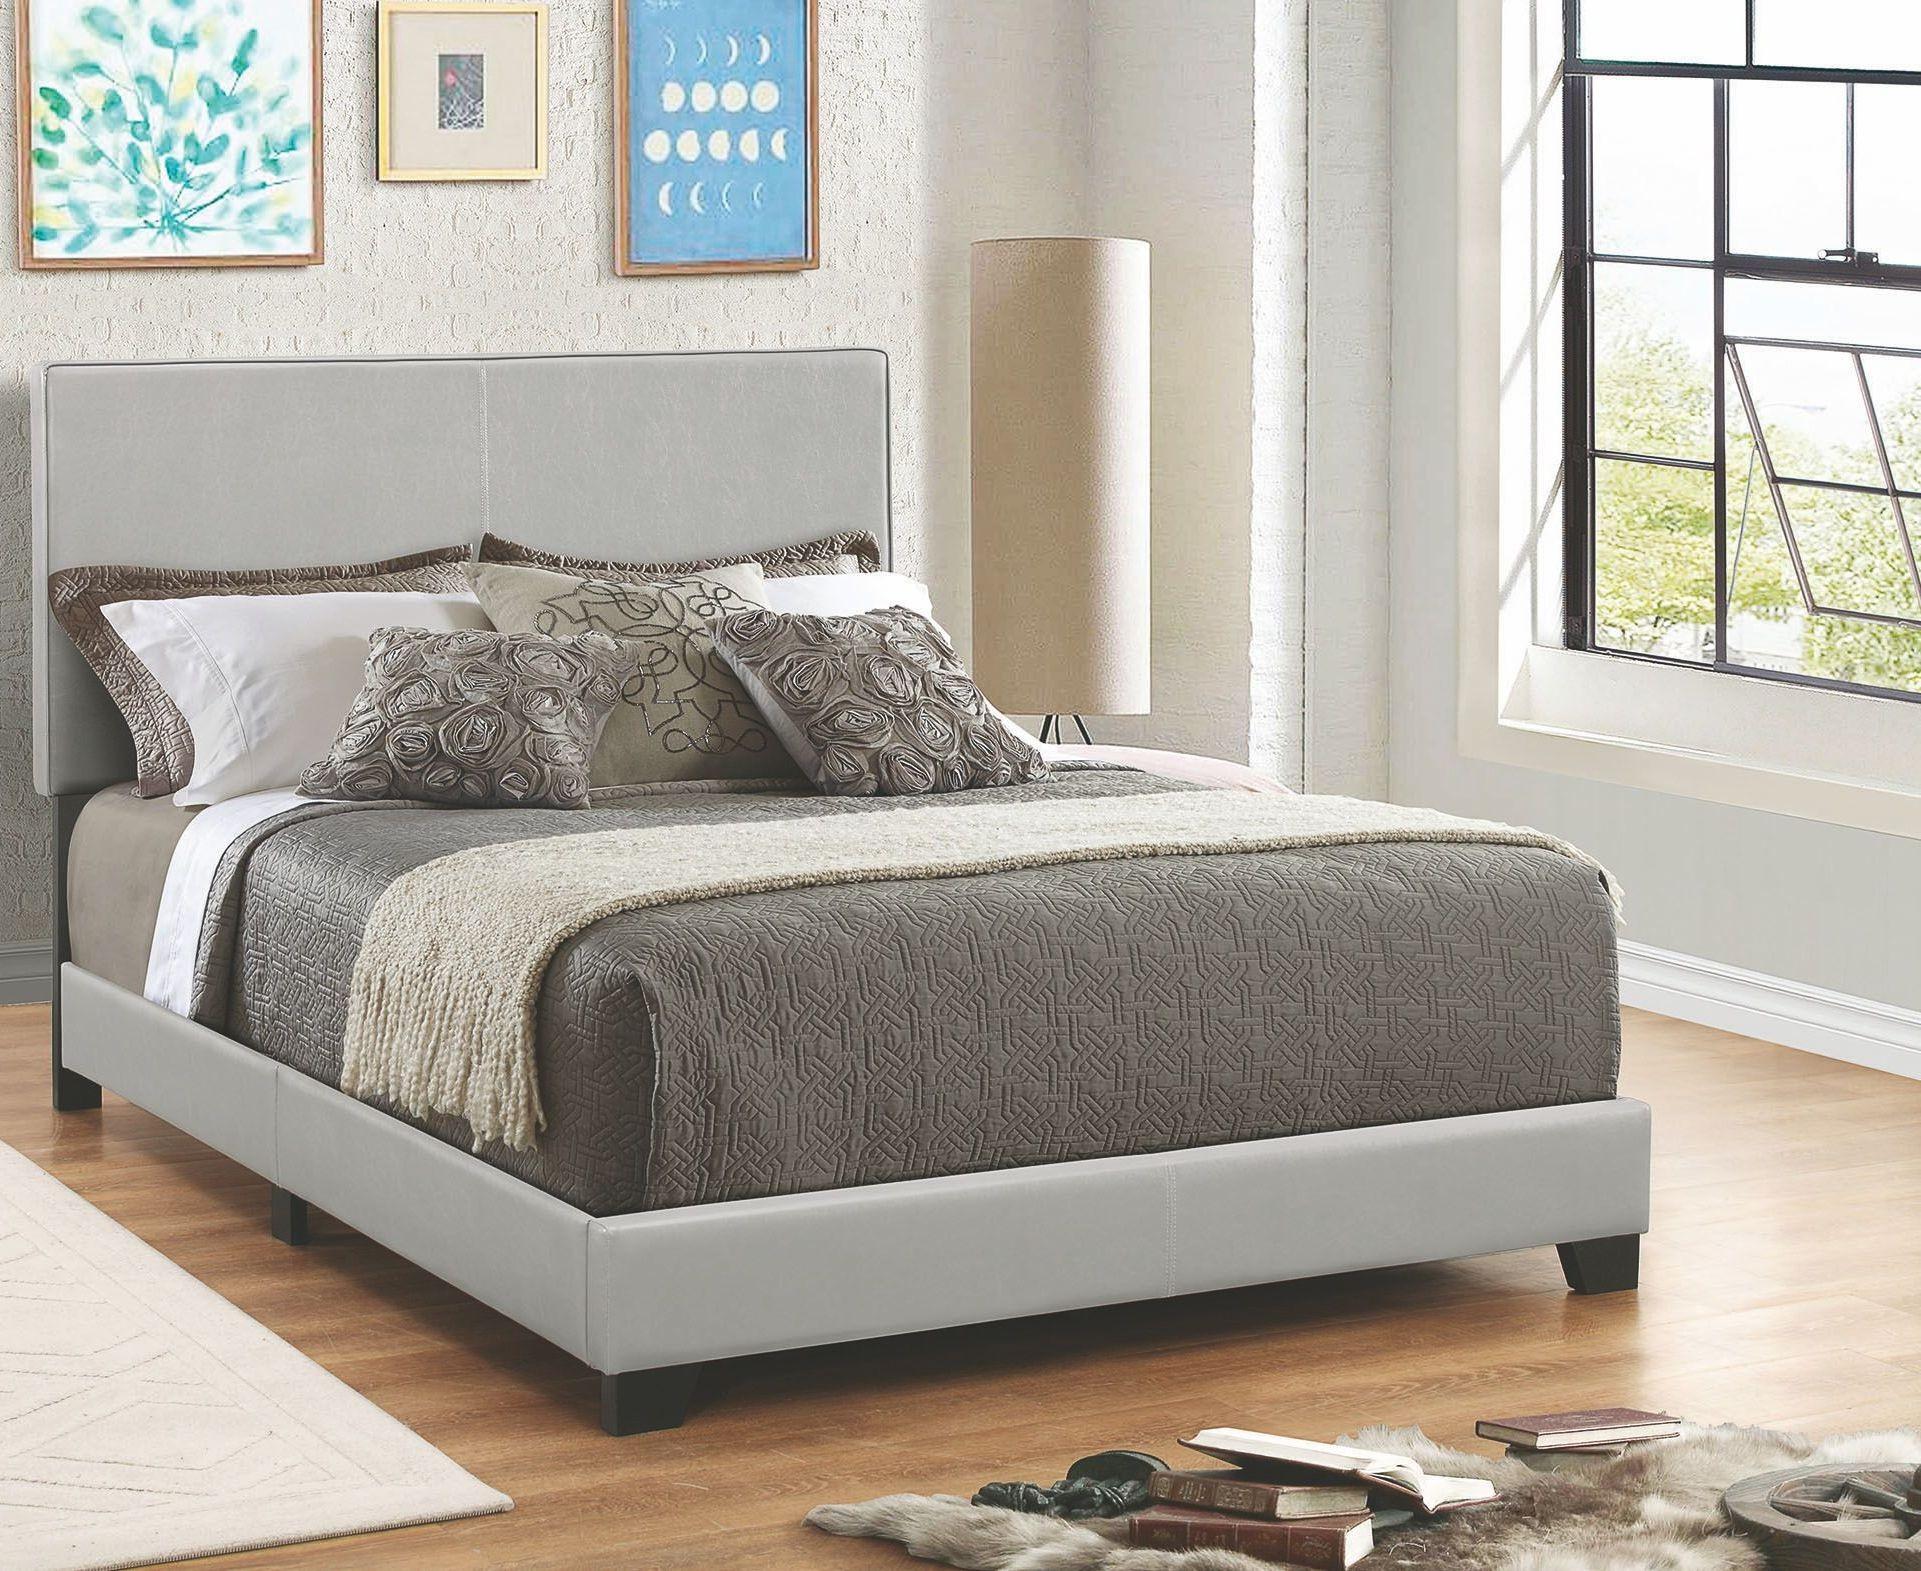 Dorian Grey Queen Upholstered Platform Bed From Coaster